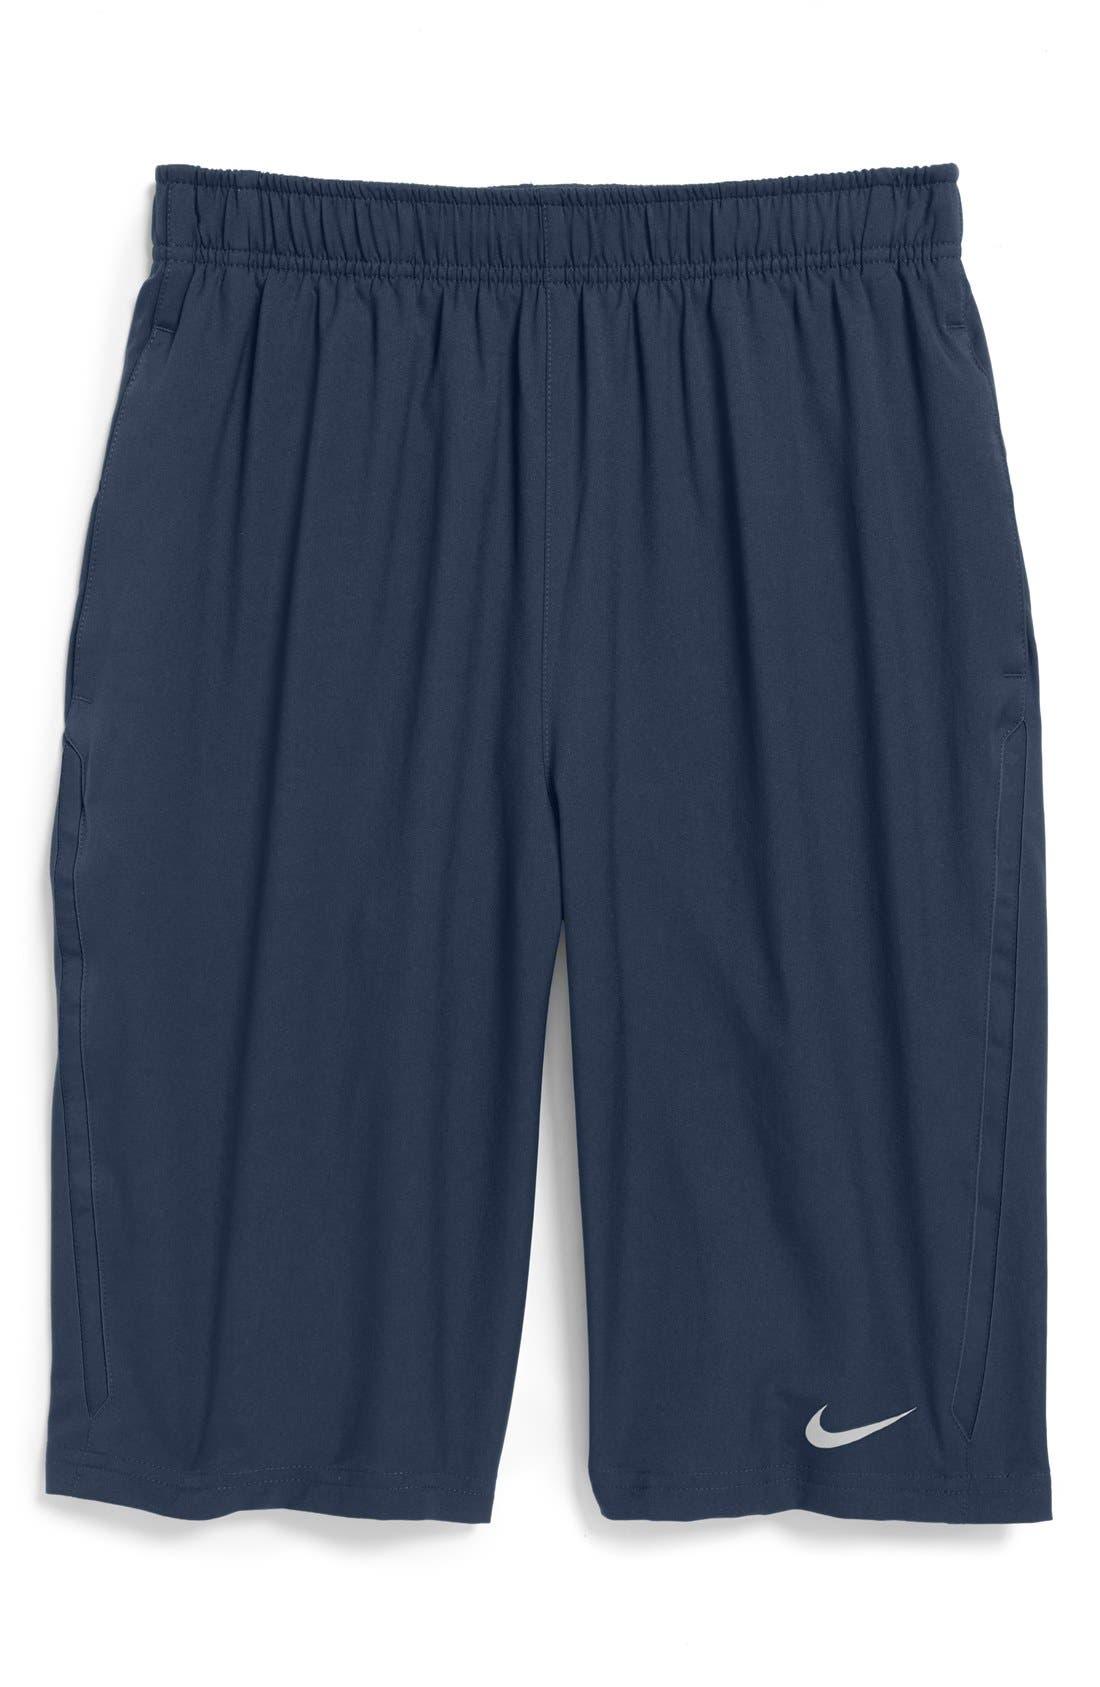 Main Image - Nike 'Boarder' Tennis Shorts (Big Boys)